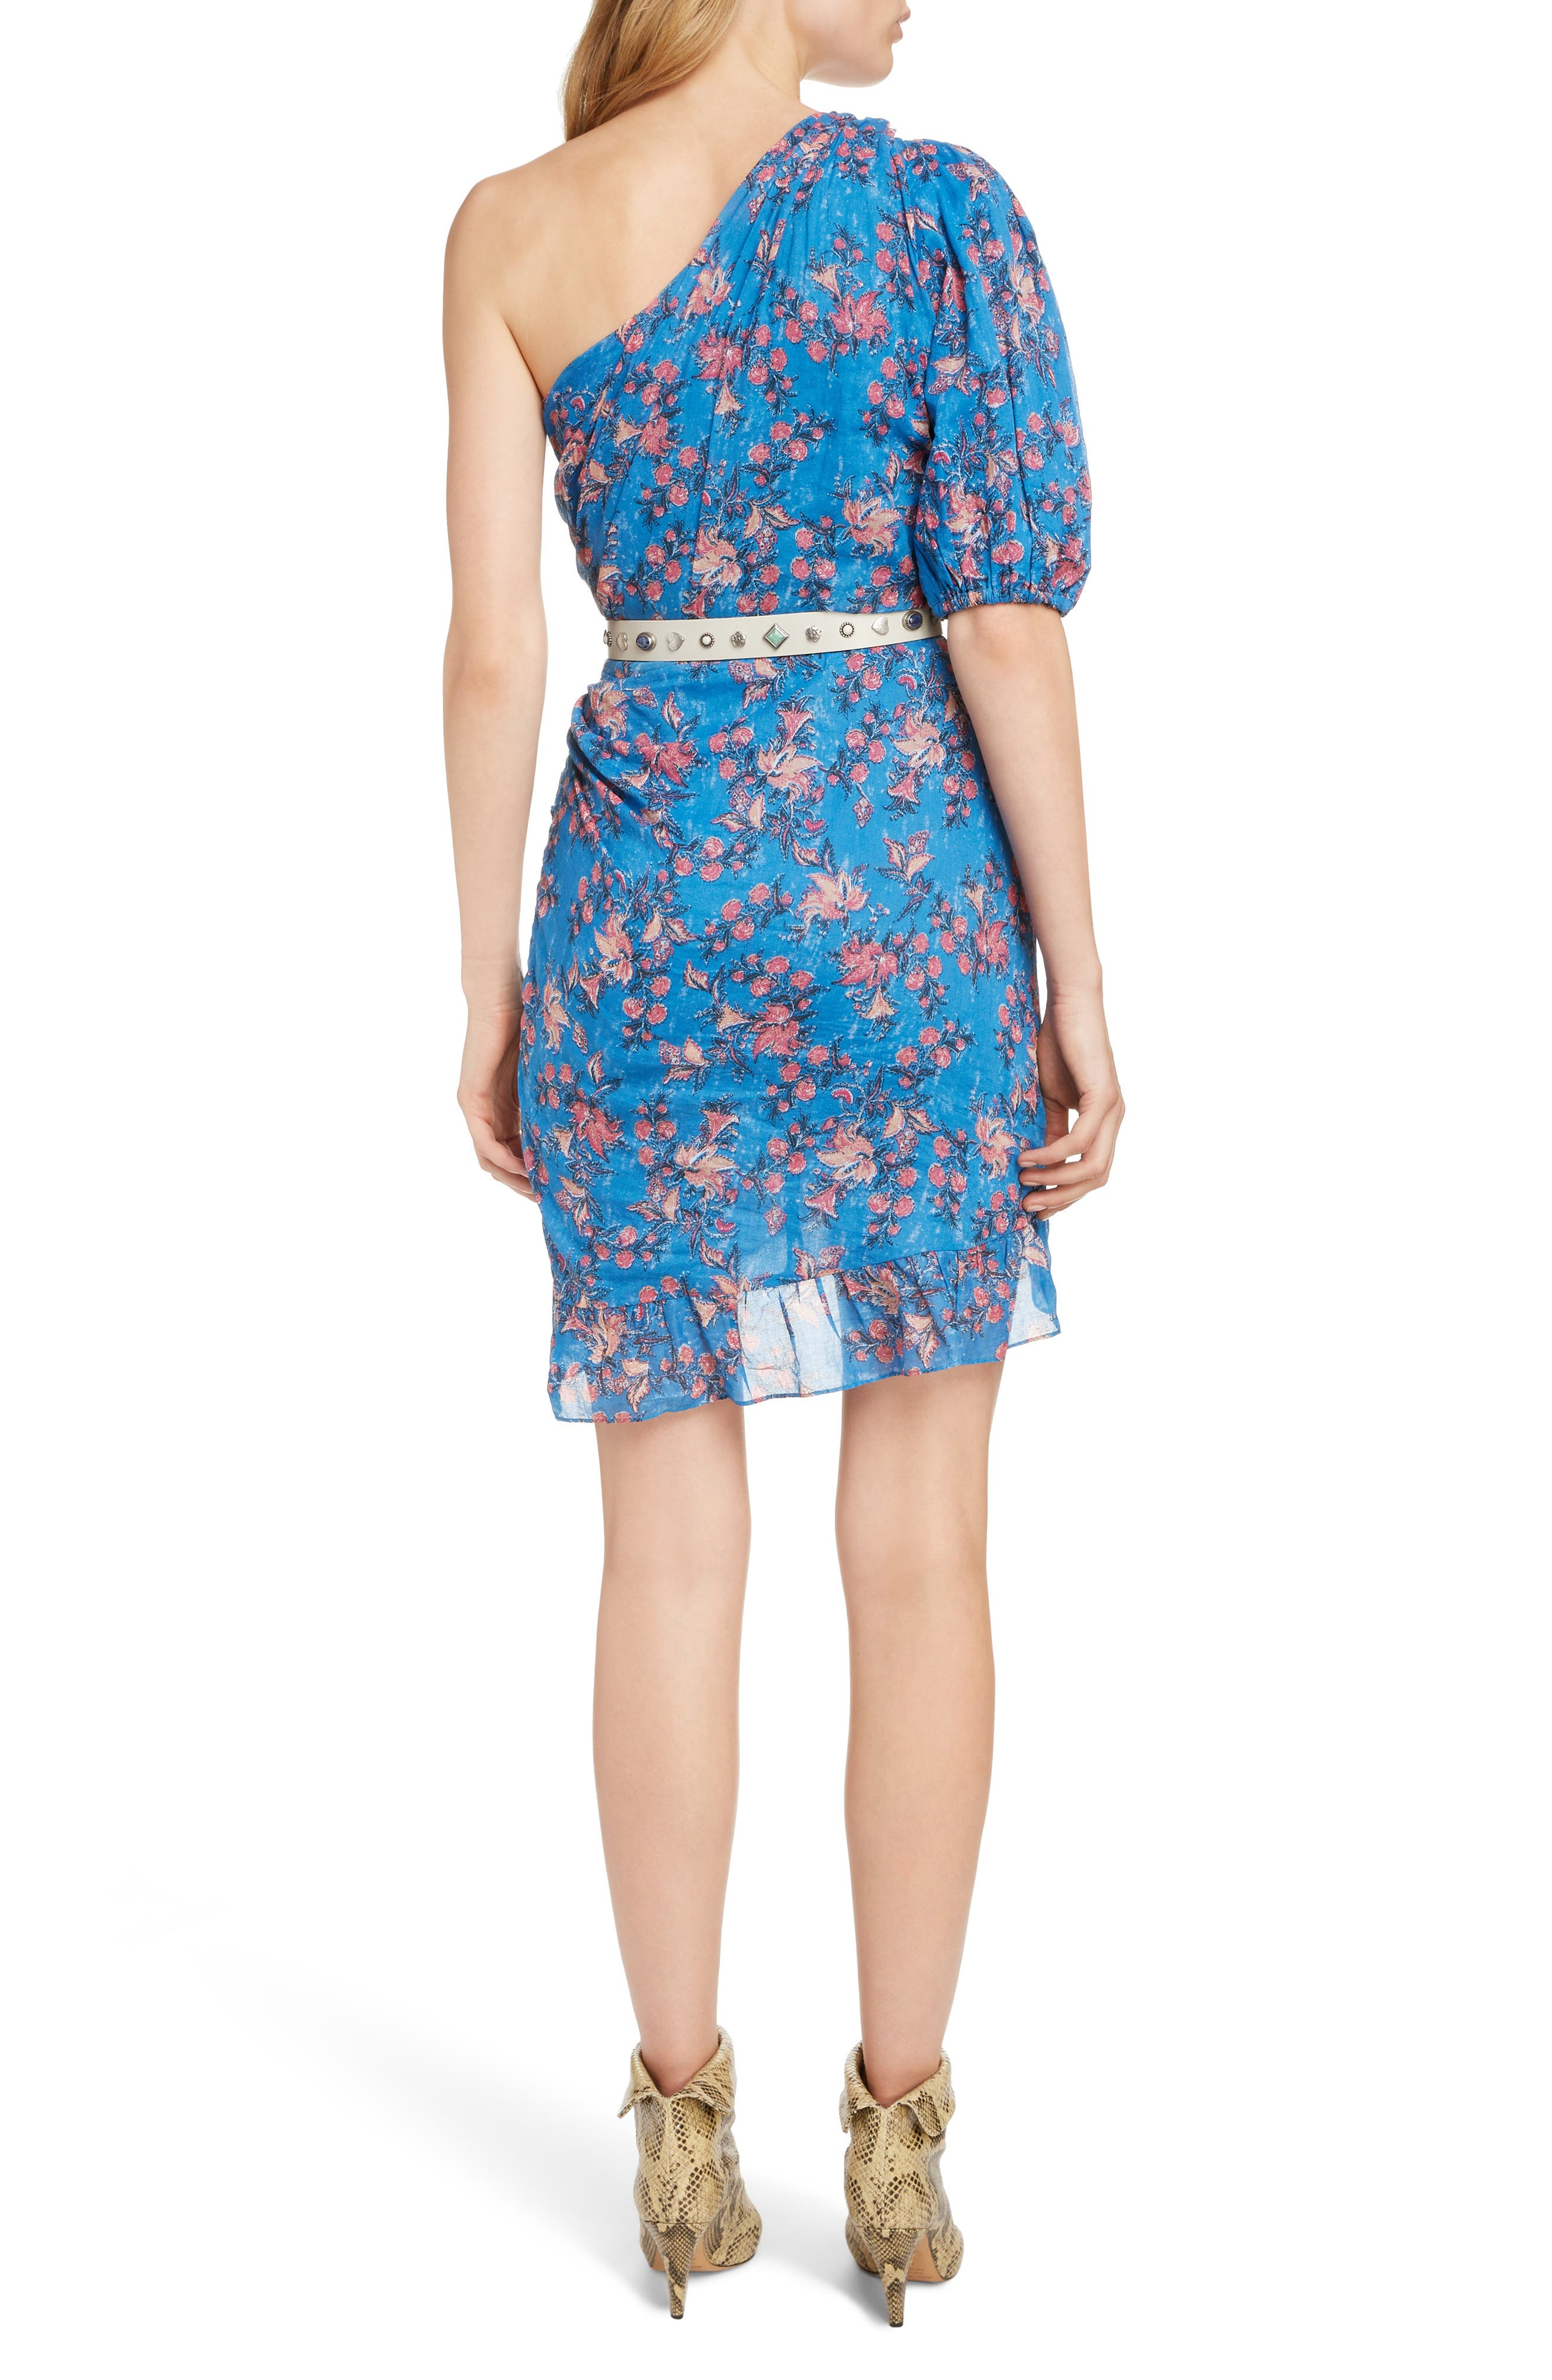 ISABEL MARANT ÉTOILE,                             Esther One-Shoulder Dress,                             Alternate thumbnail 2, color,                             BLUE